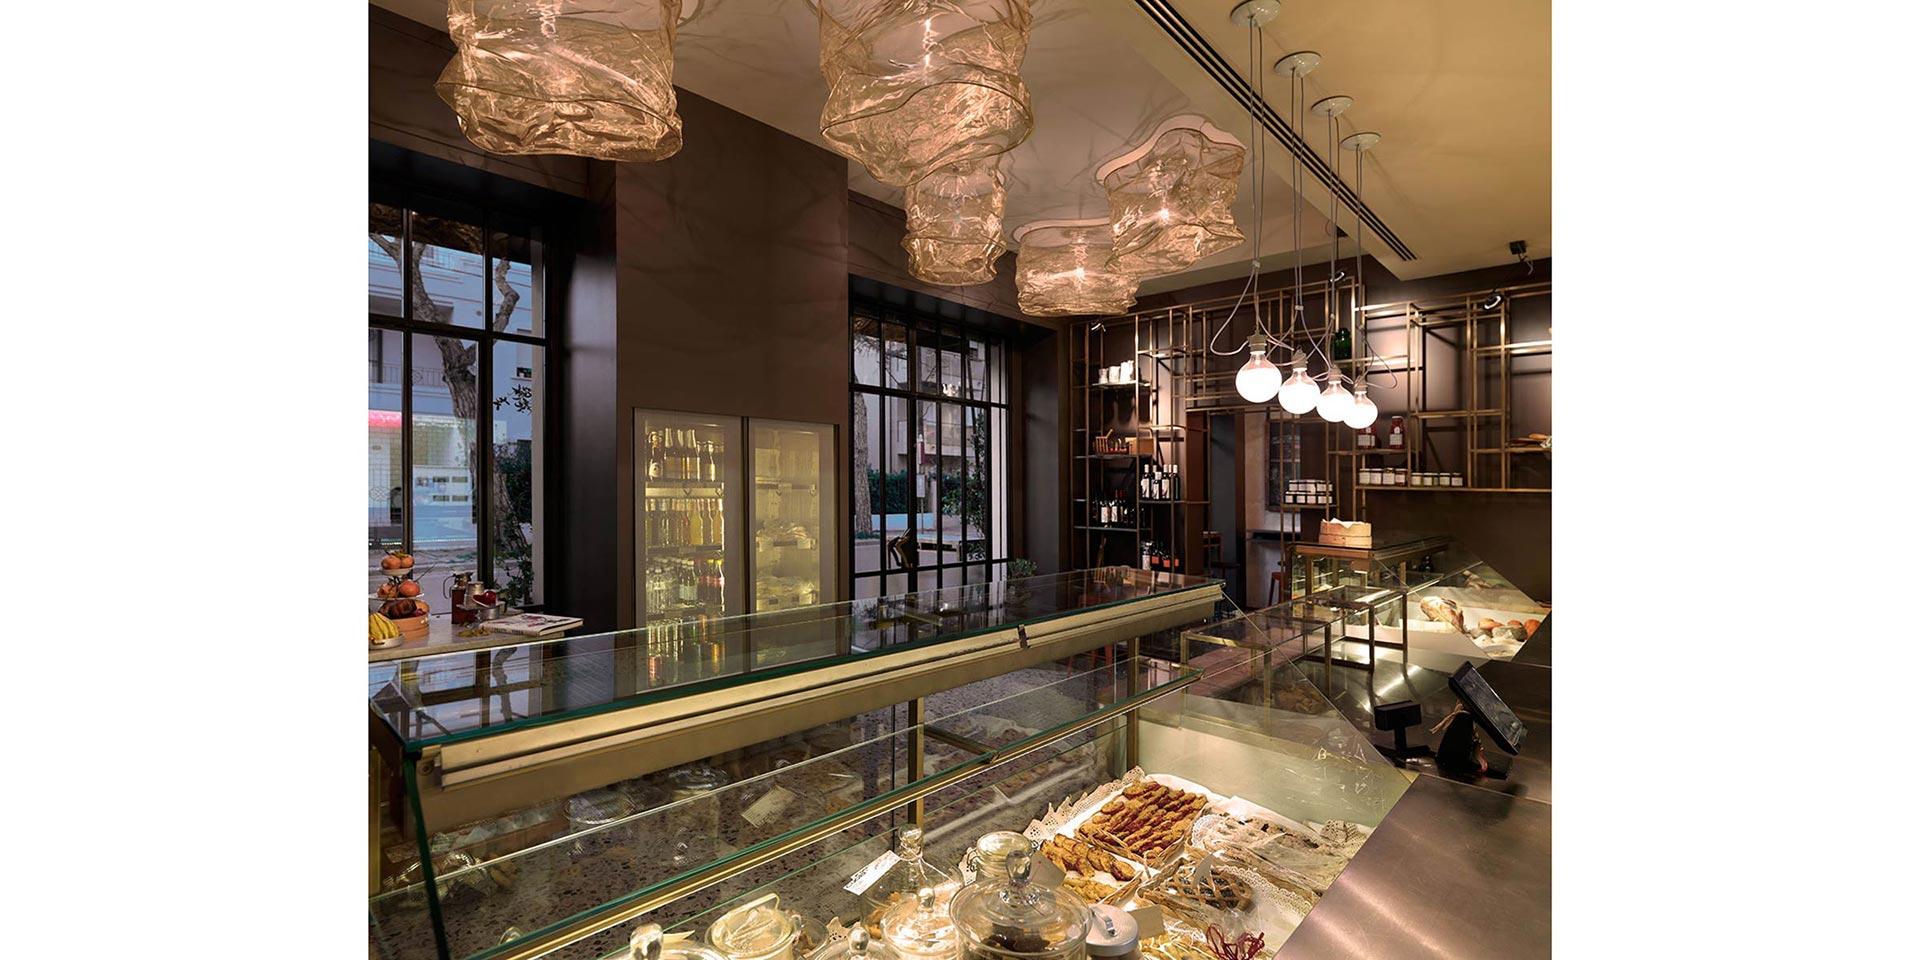 archinow_LEL_street-food-store_03